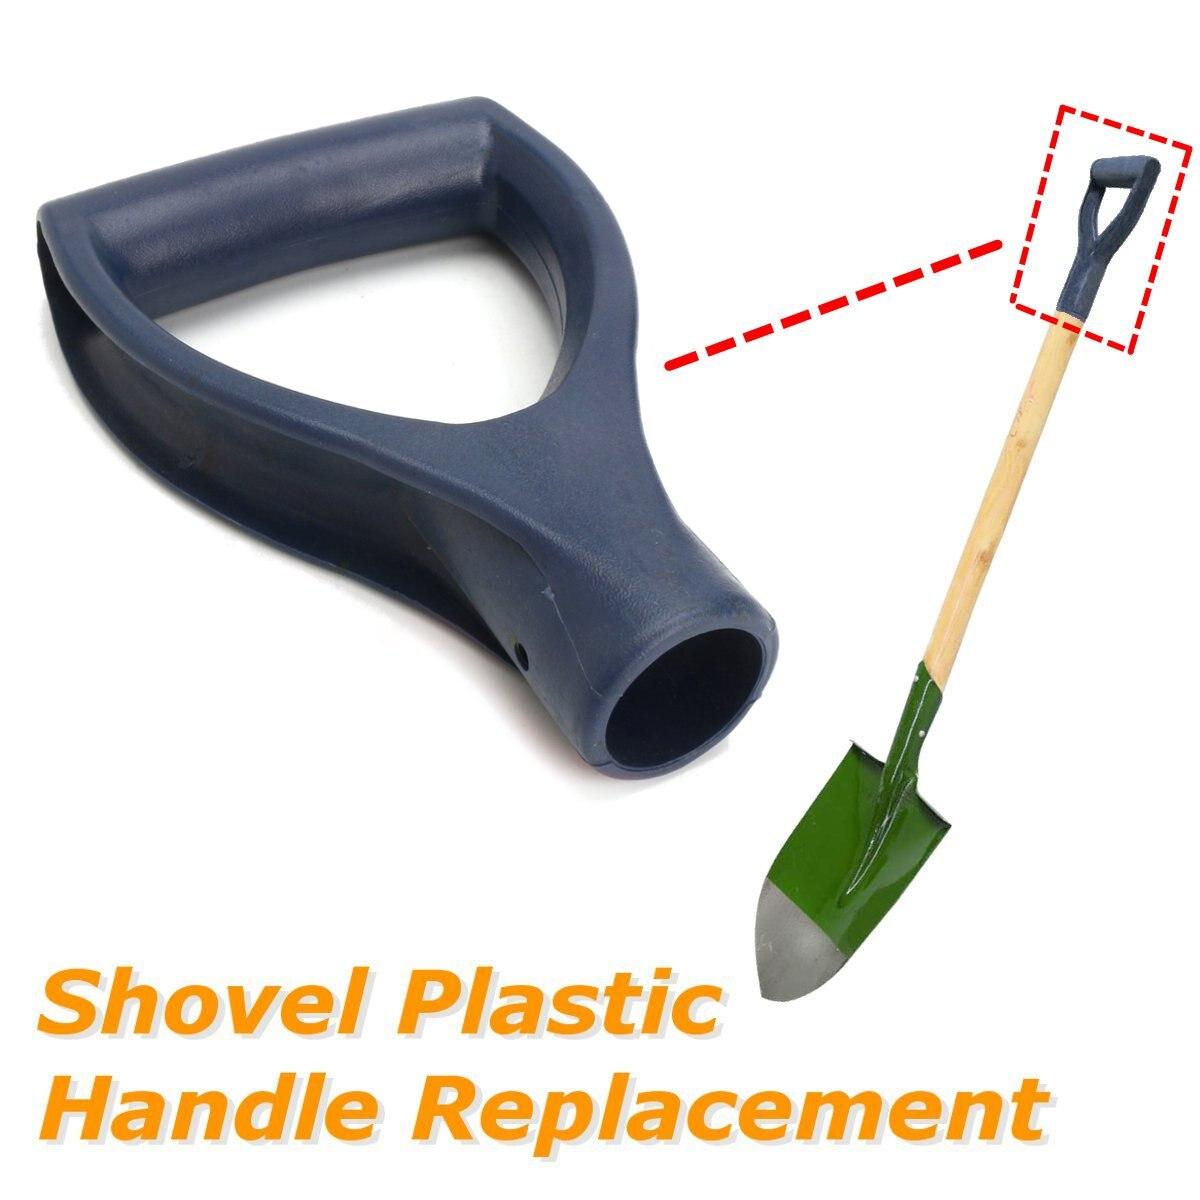 30mm D-shaped Steel Shovel Handle Black Plastic Replacement Accessories Snow Shovel Top Handle Garden Digging Raking Tools